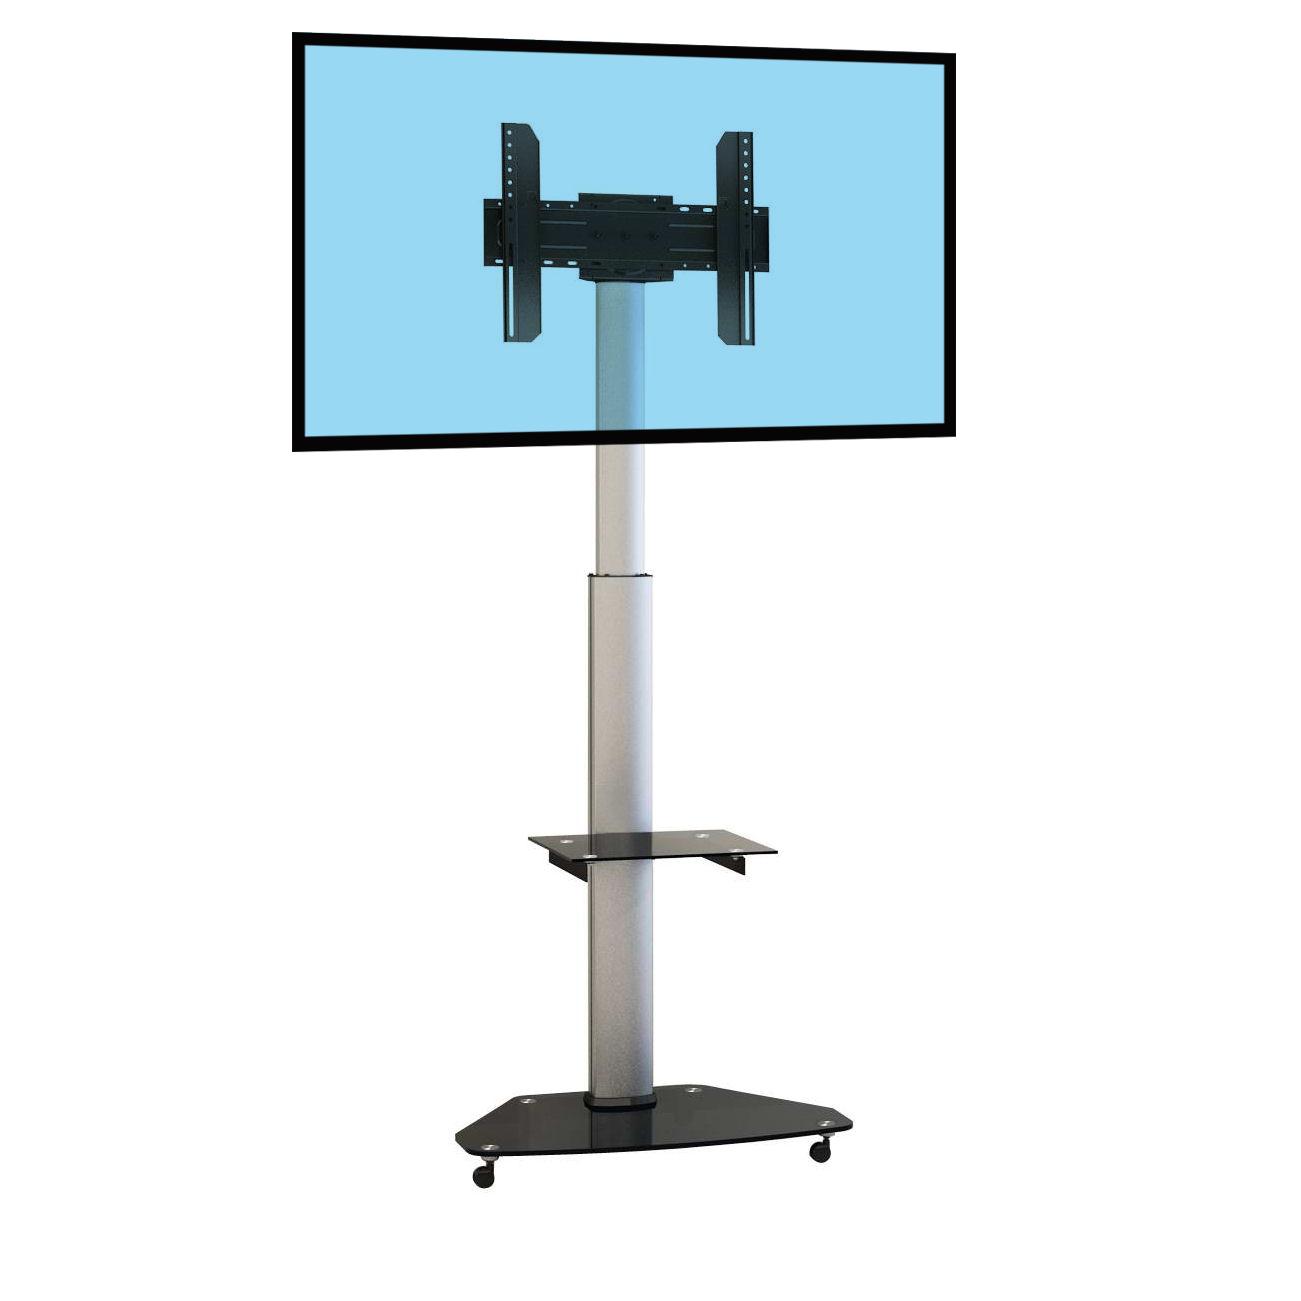 code fiche produit 5326385. Black Bedroom Furniture Sets. Home Design Ideas